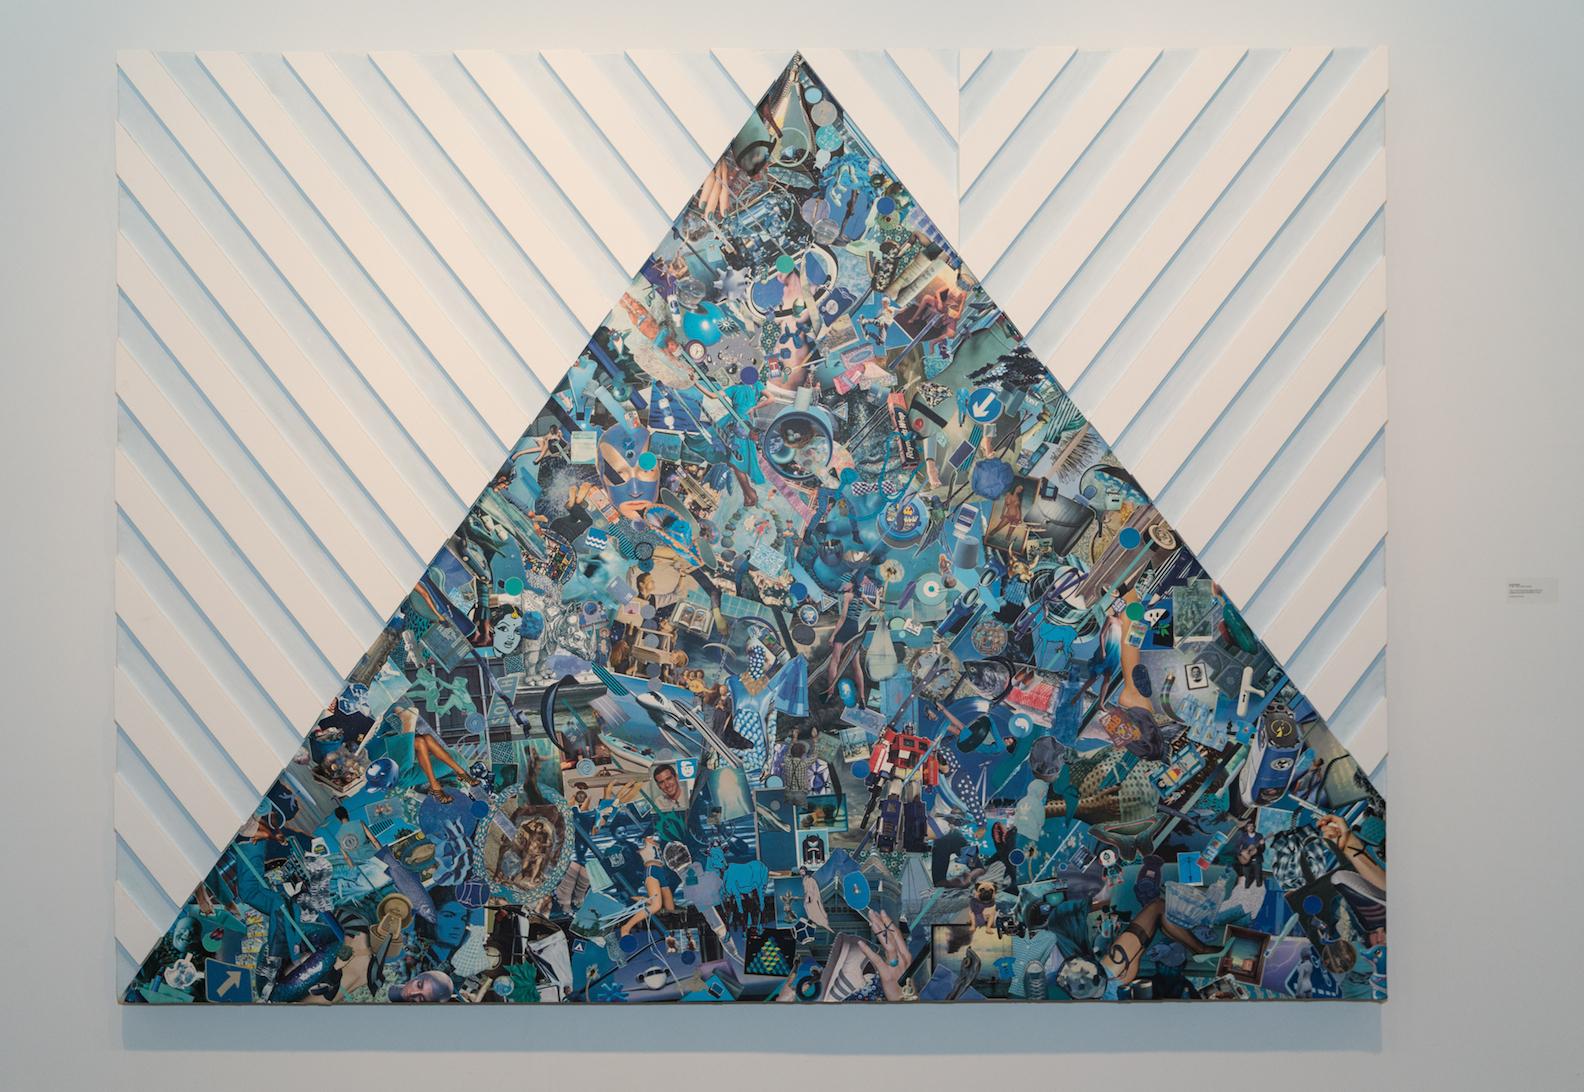 "FullCRUMB (azure die agony all), 2013, wood wax latex collage on wood, 74x100"""